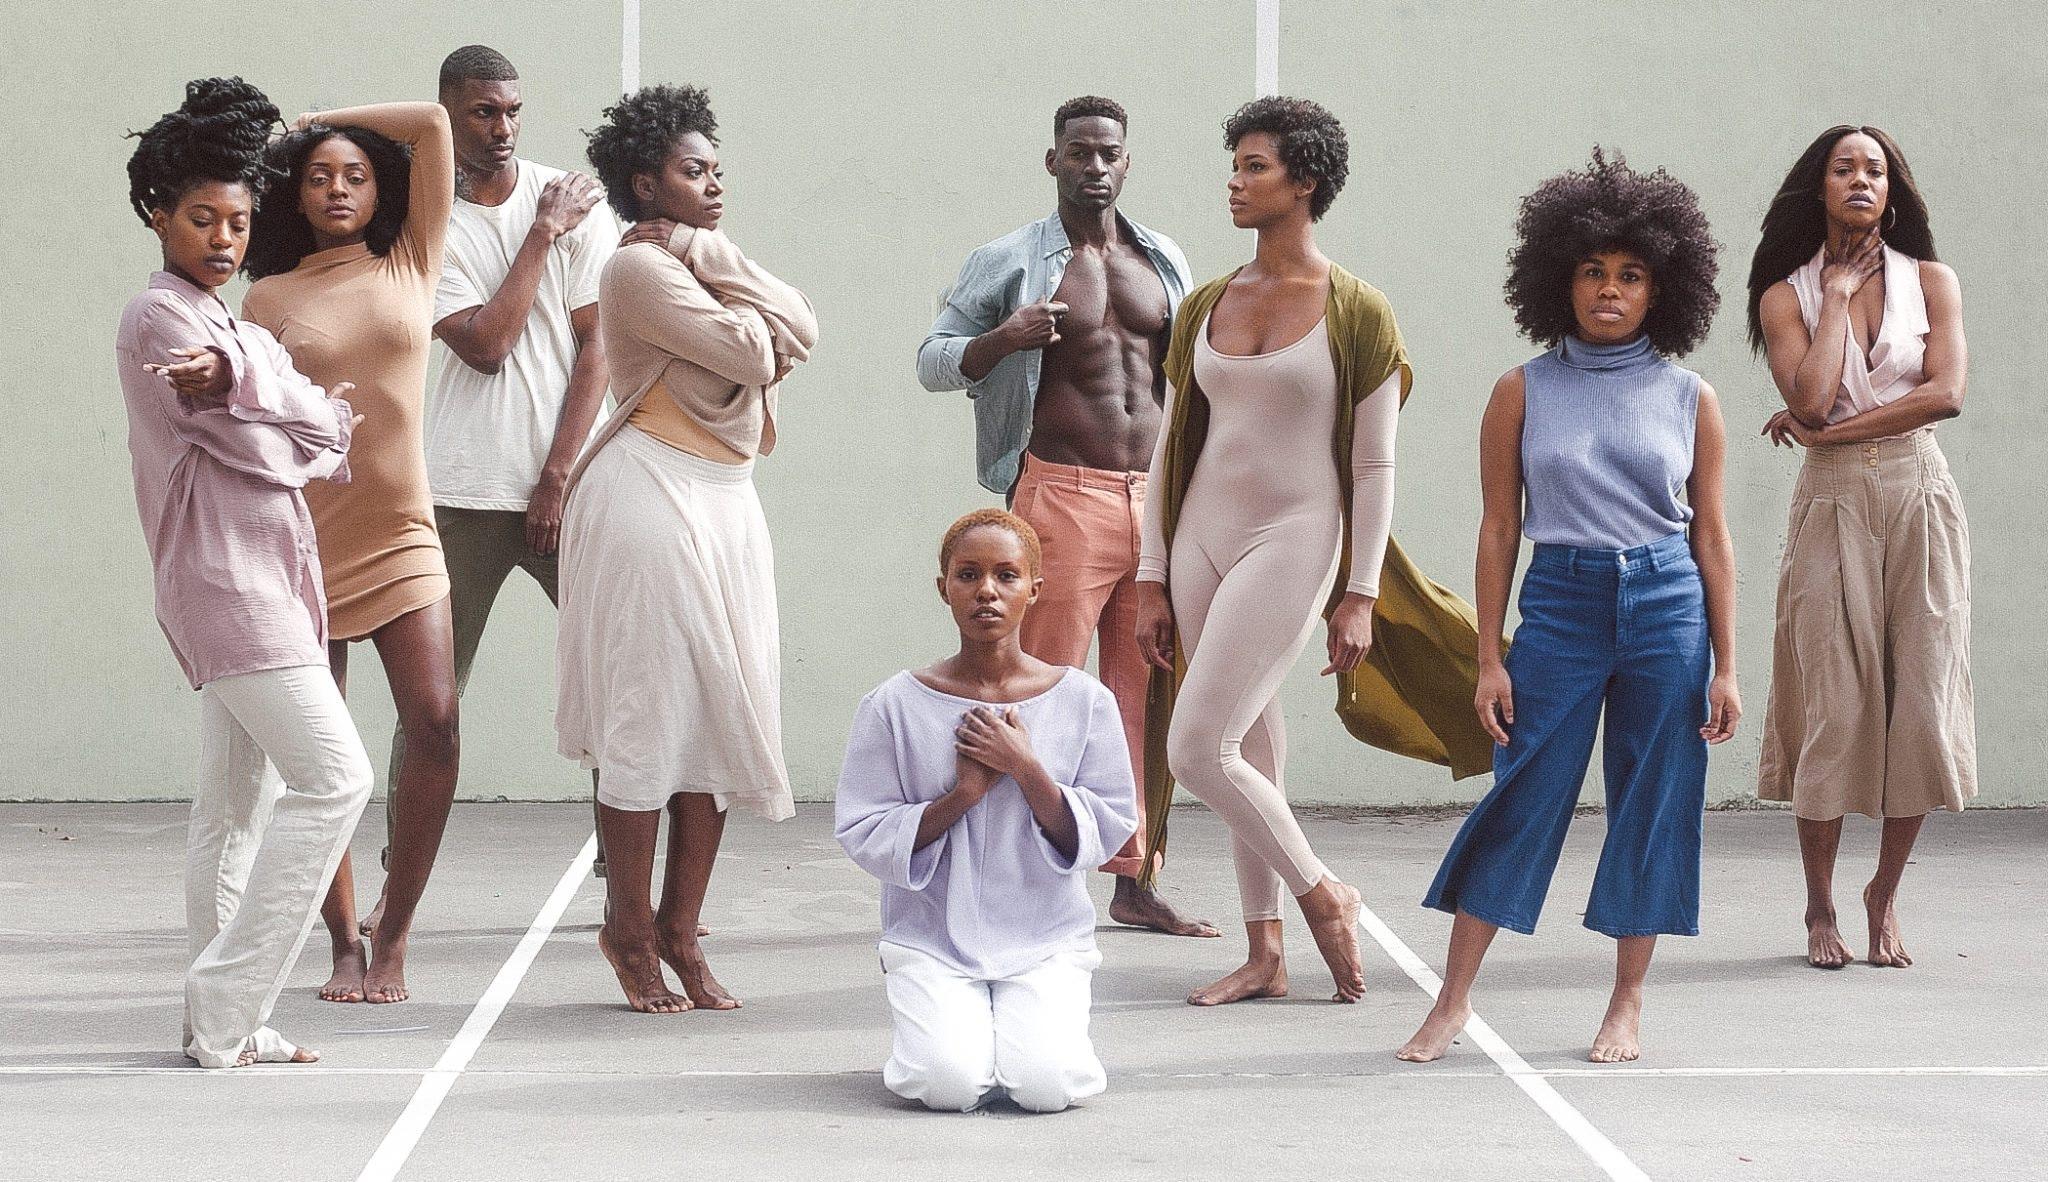 Black community. https://www.info-on-high-blood-pressure.com/your-doctor.html